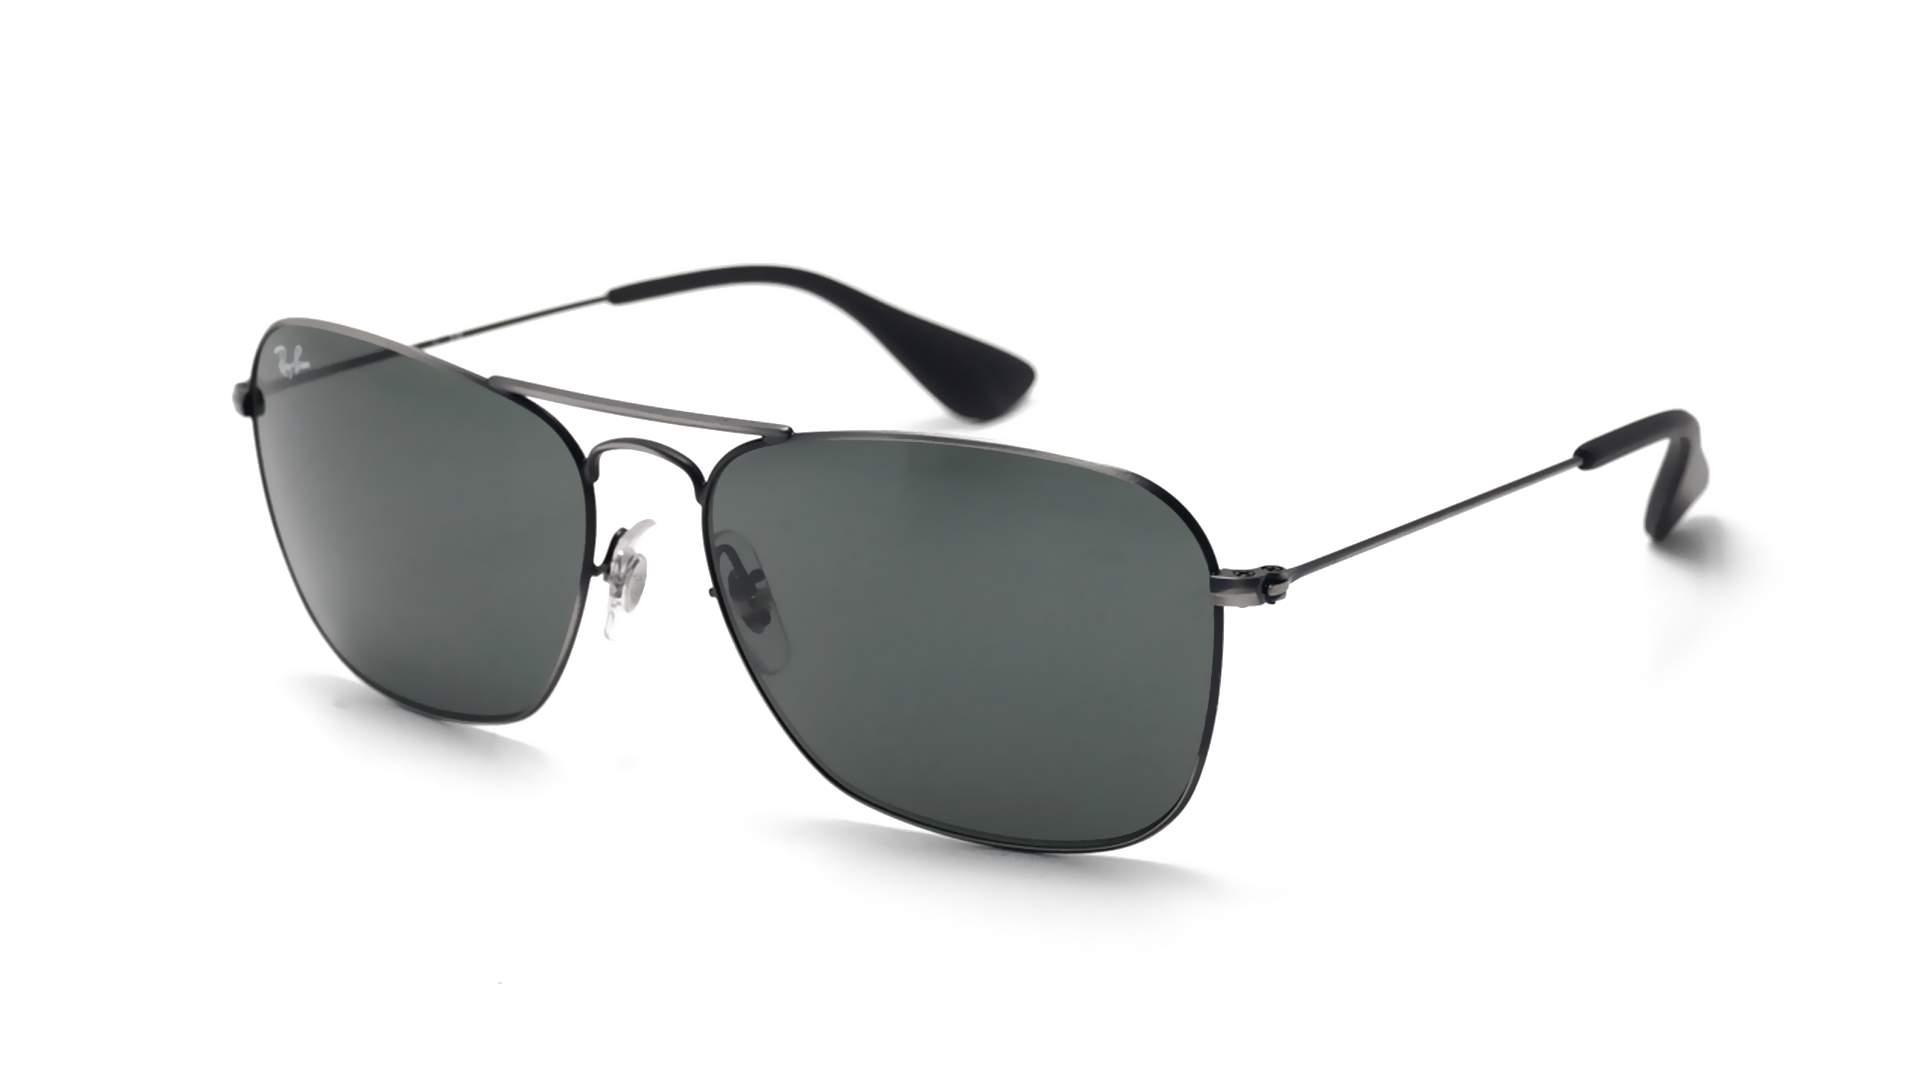 033a8b7fd07 Sunglasses Ray-Ban RB3610 913971 58-15 Grey Matte Large